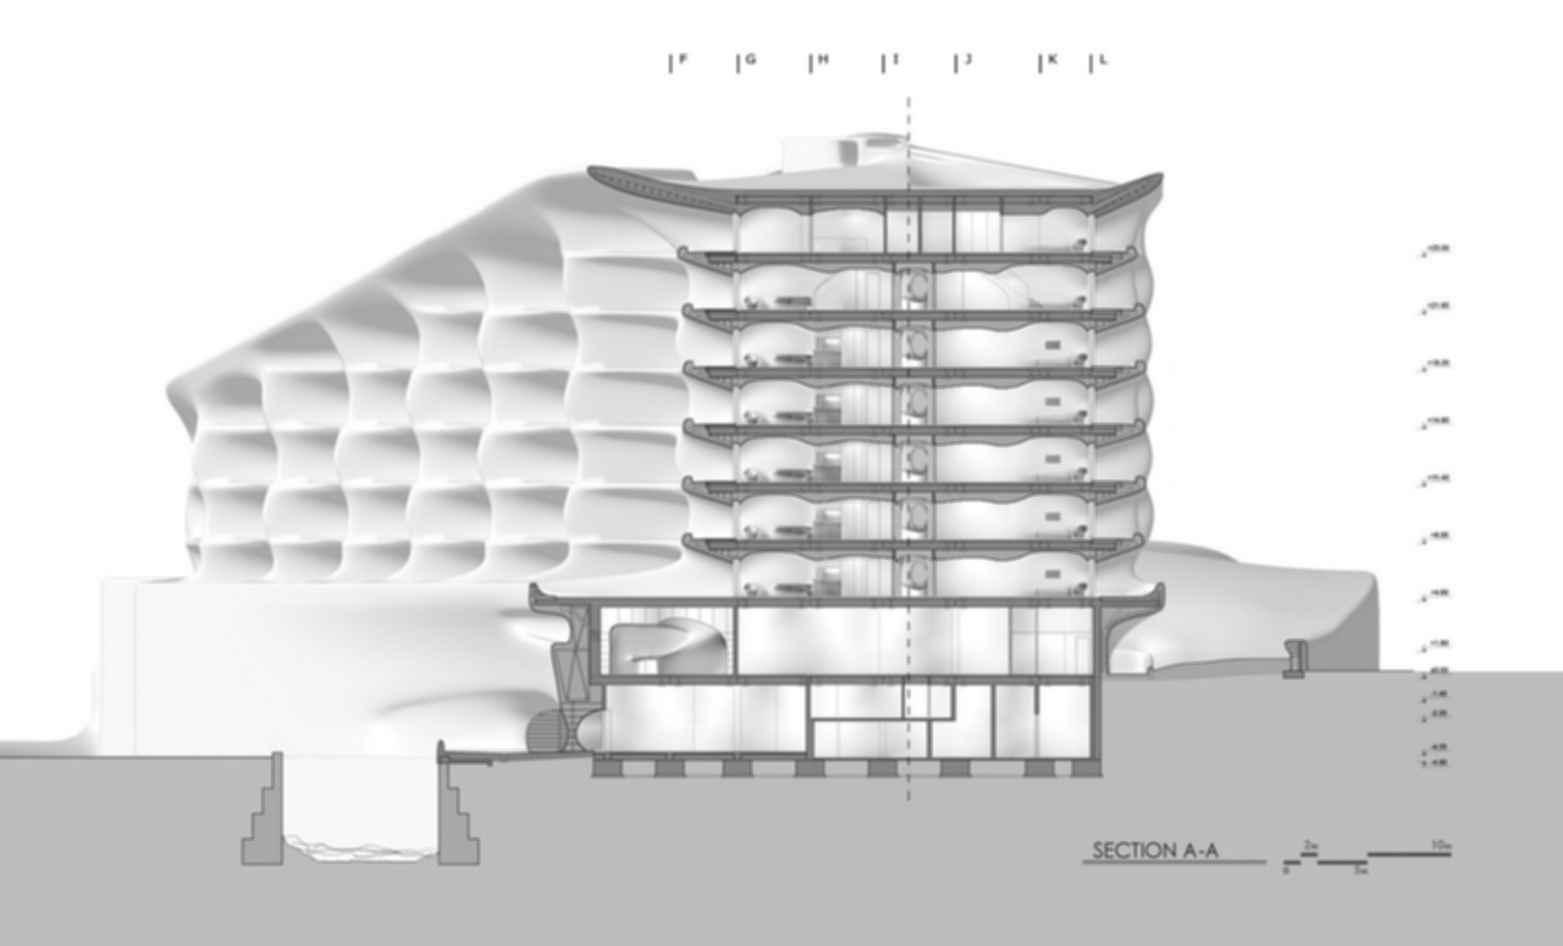 Barin Ski Resort - Concept Design